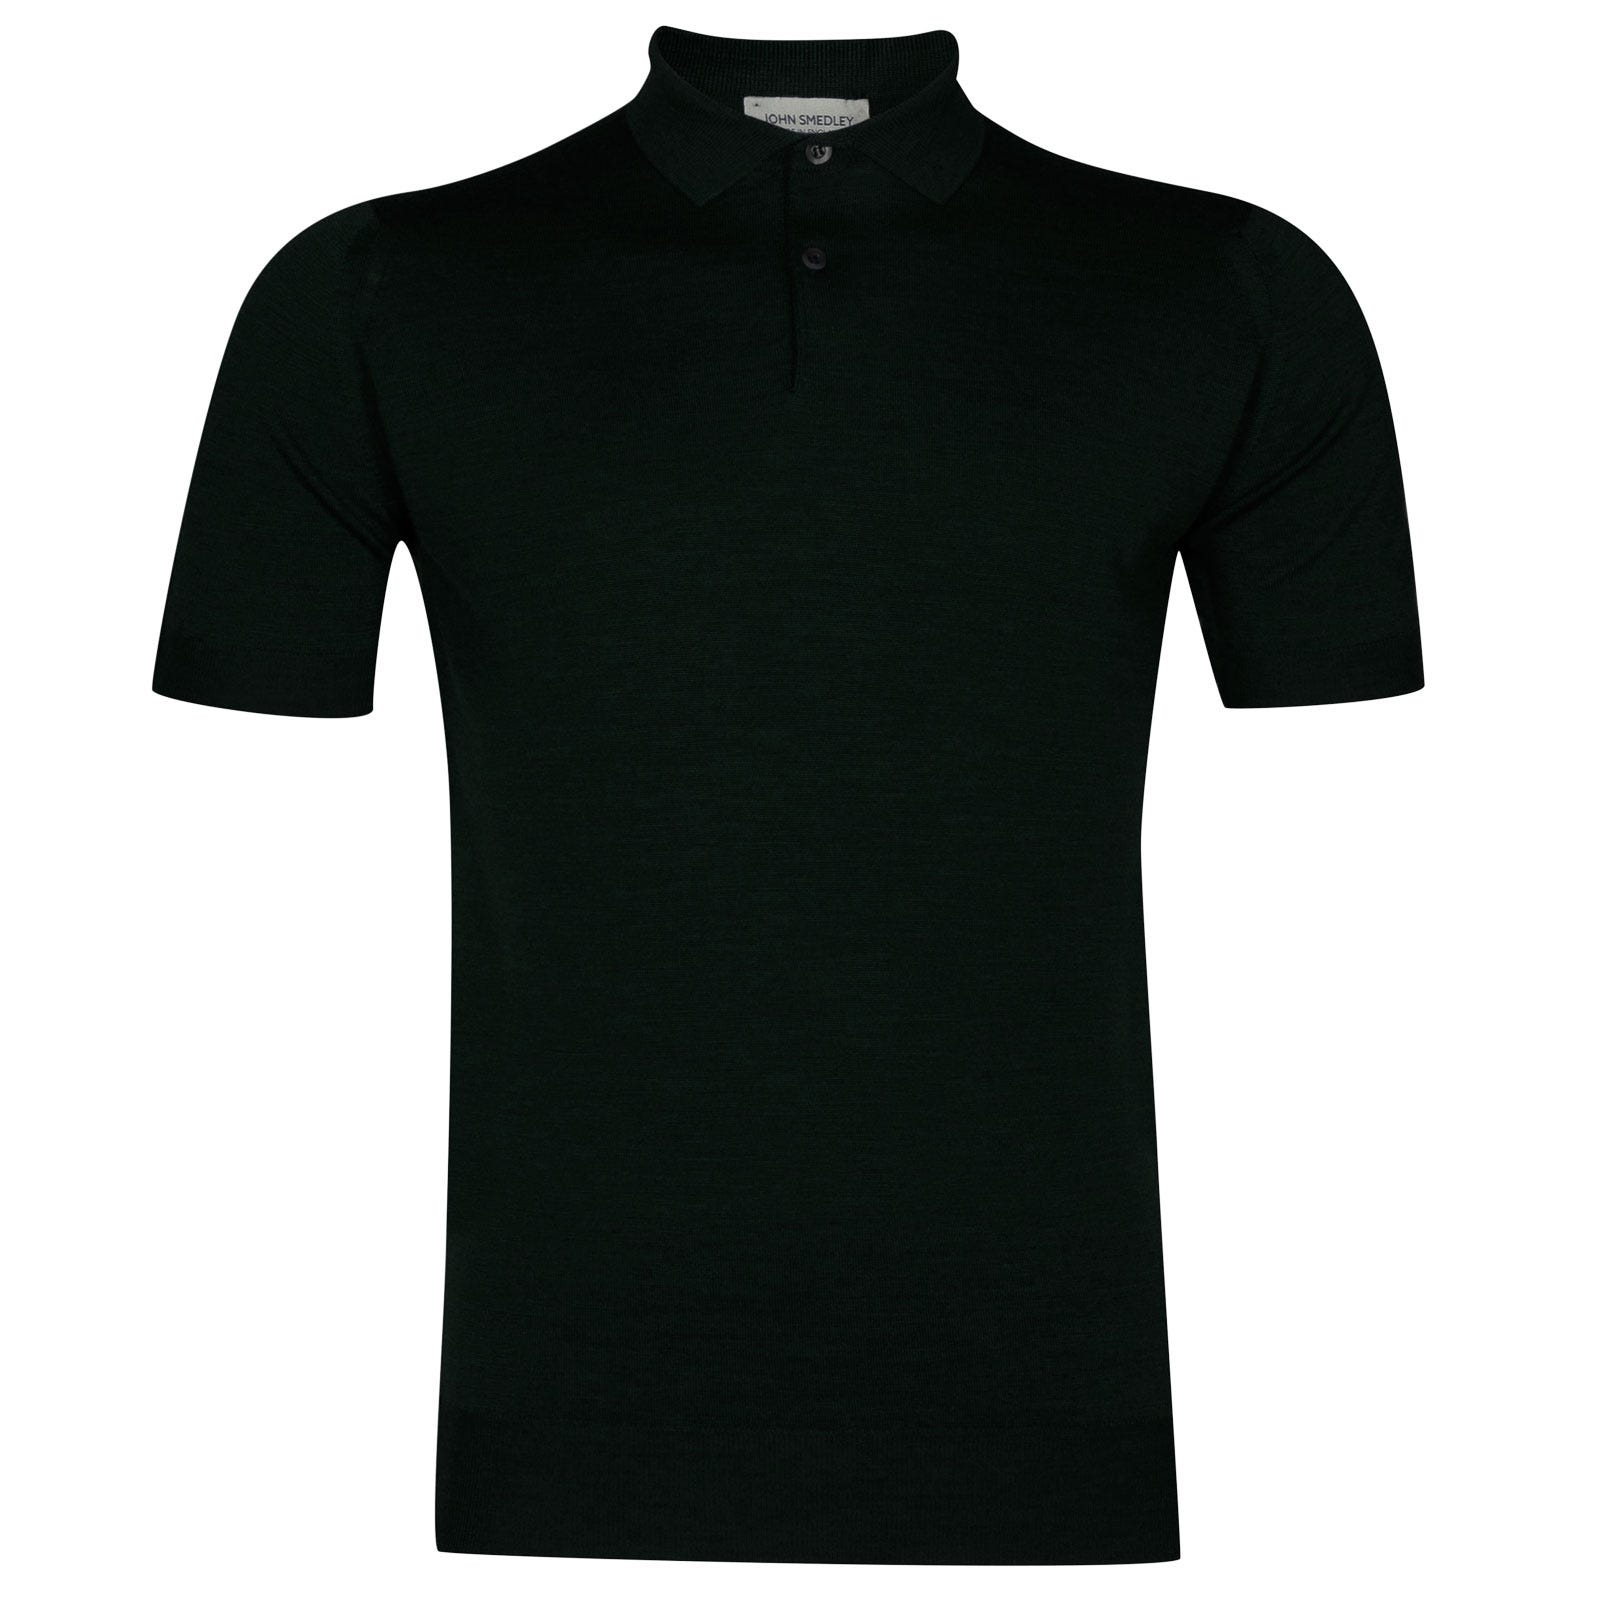 John Smedley Payton Merino Wool Shirt in Racing Green-L